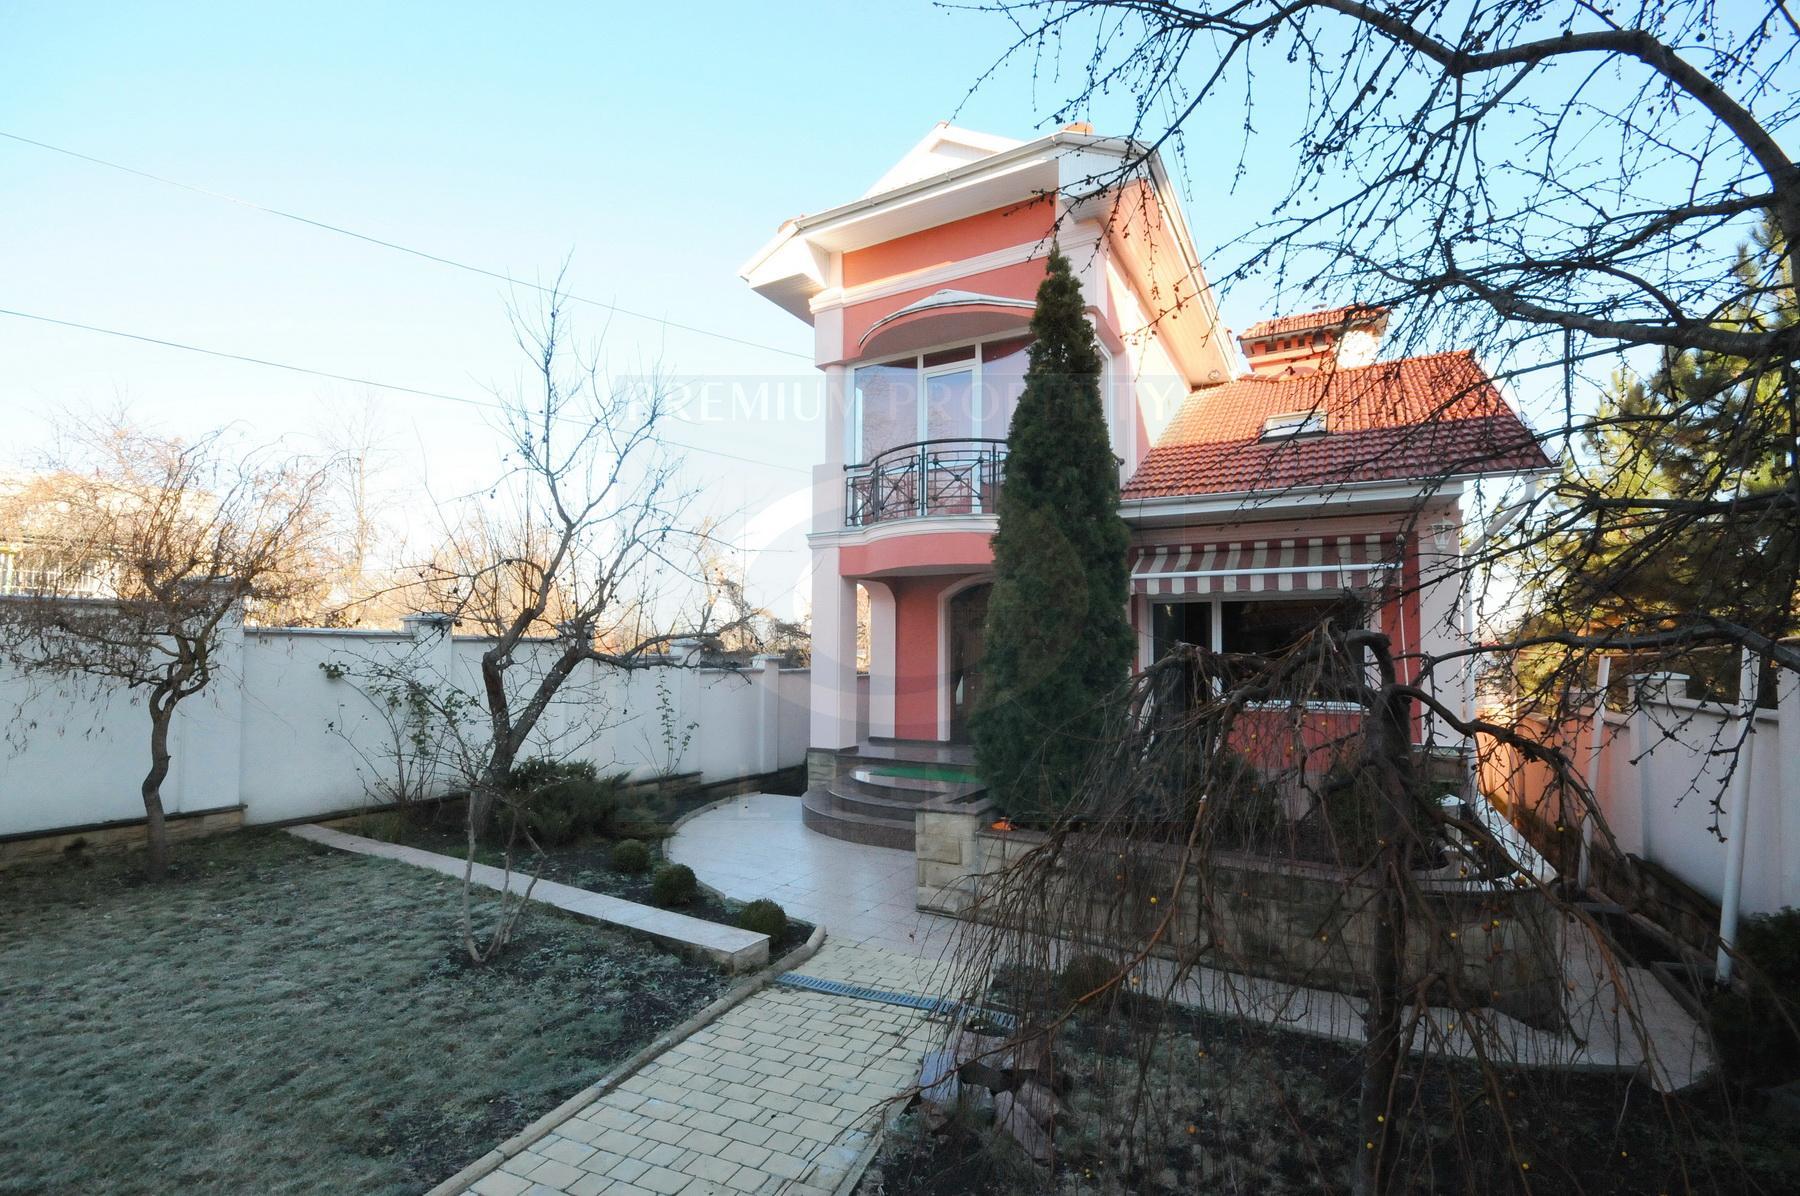 G.Meniuc street